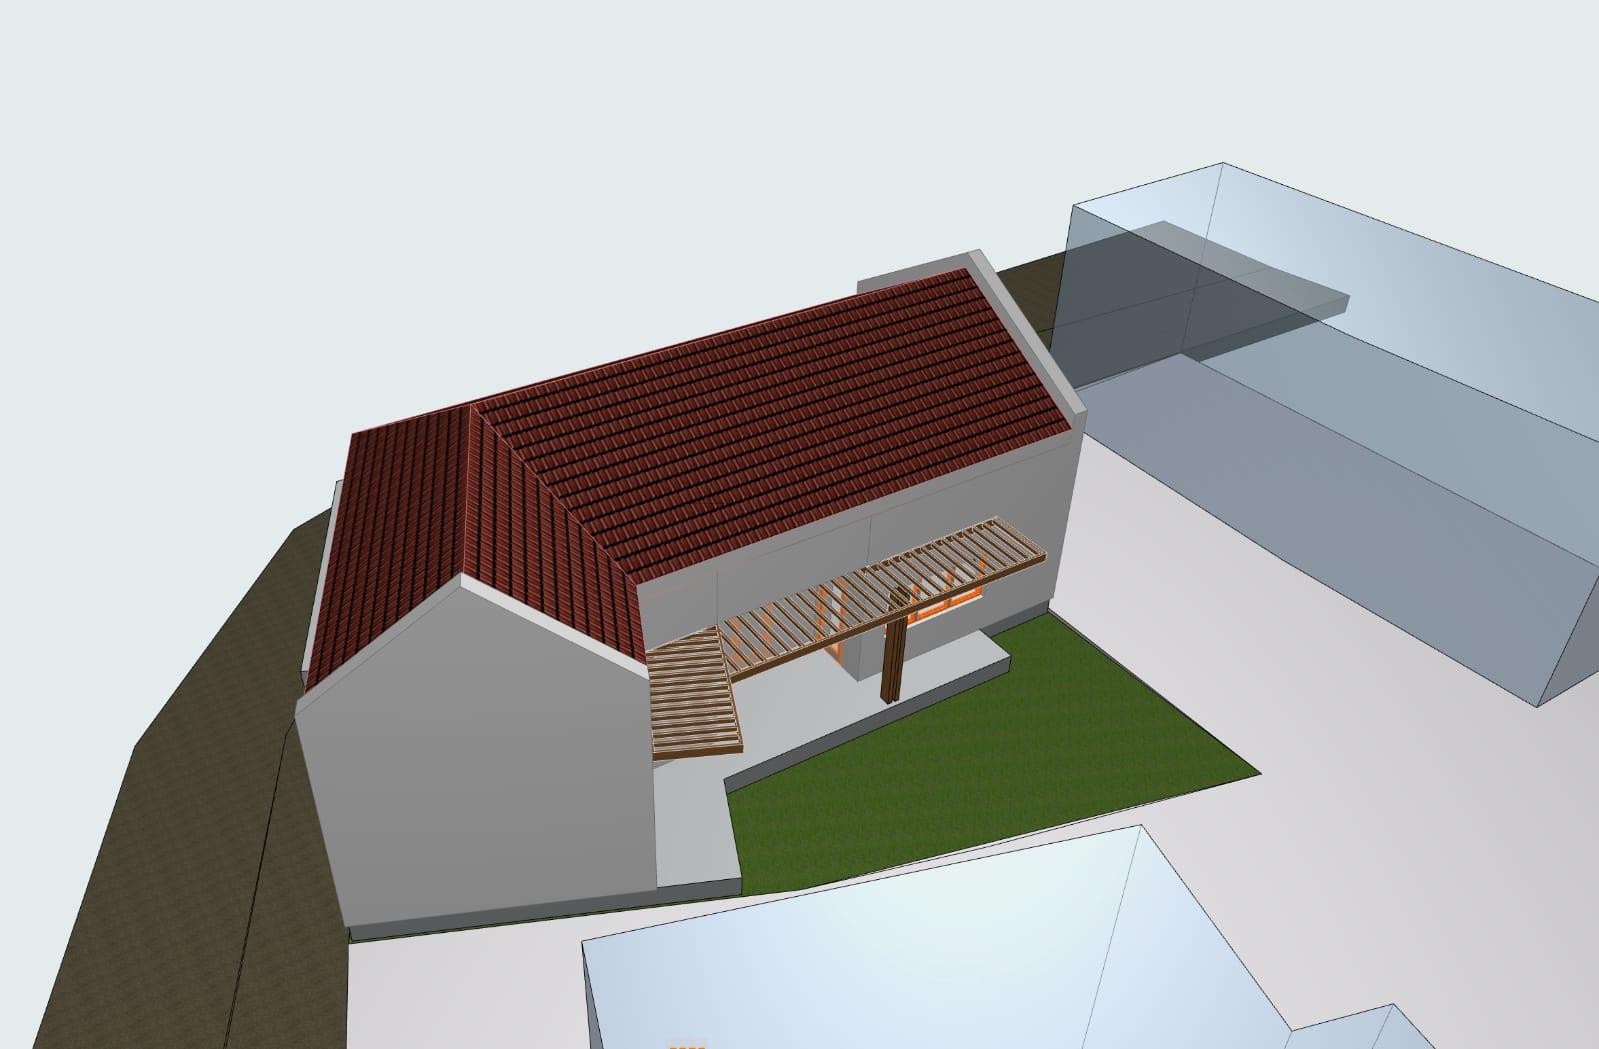 Vand teren cu proiect de casa zona Podgoria-Ineului